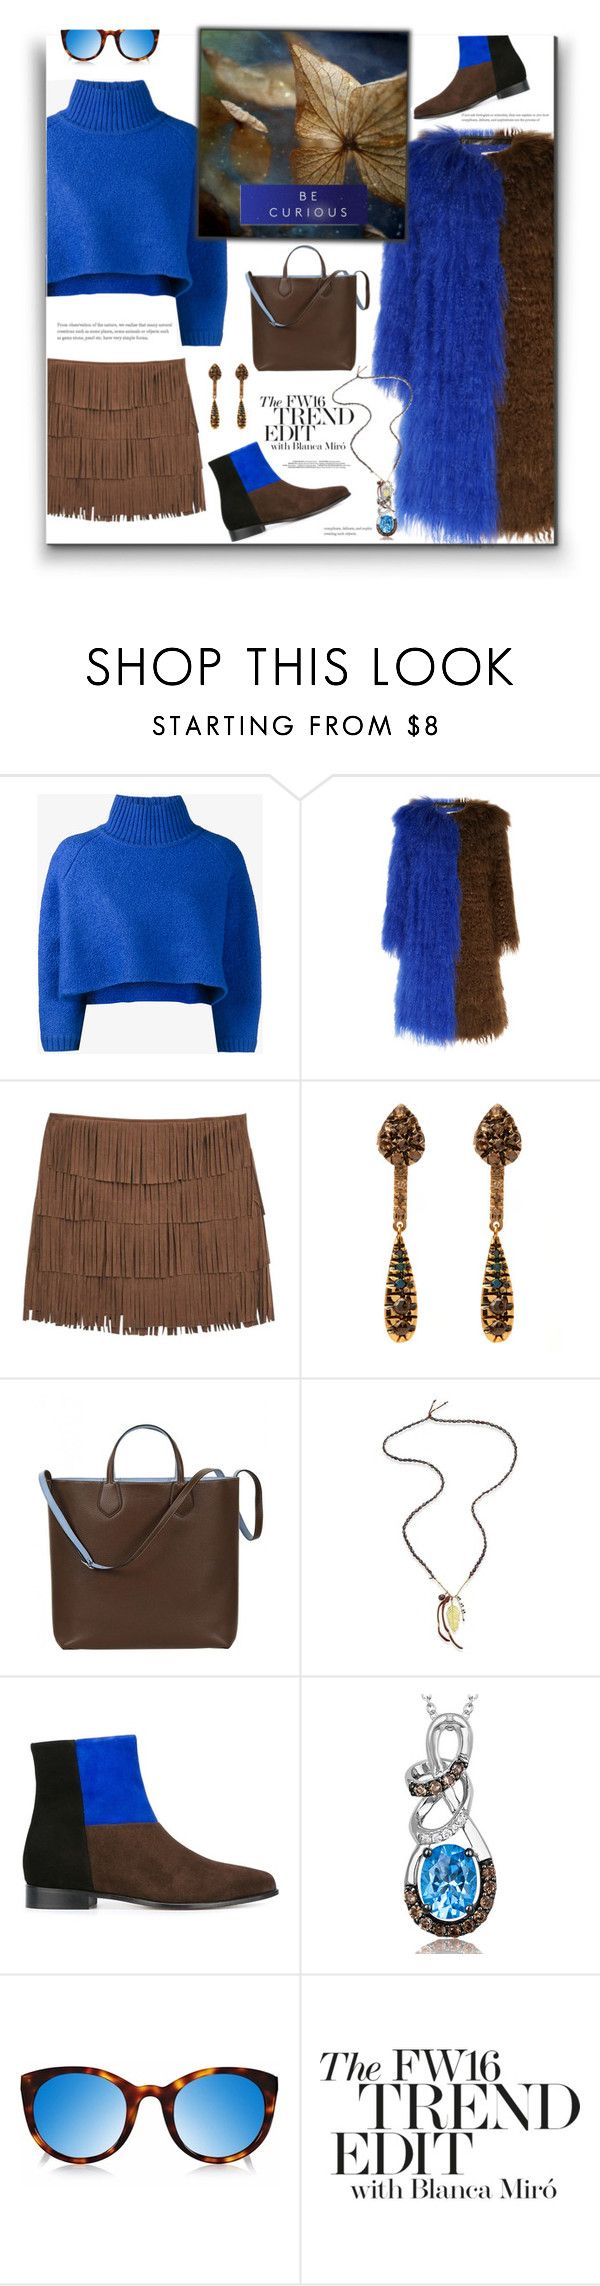 """The Fashion Report | Blue for Fall"" by fassionista ❤ liked on Polyvore featuring Vika Gazinskaya, Saks Potts, MANGO, Fabrizio Riva, Gucci, Chan Luu, ANNA BAIGUERA, White Label, Finlay & Co. and Miró"